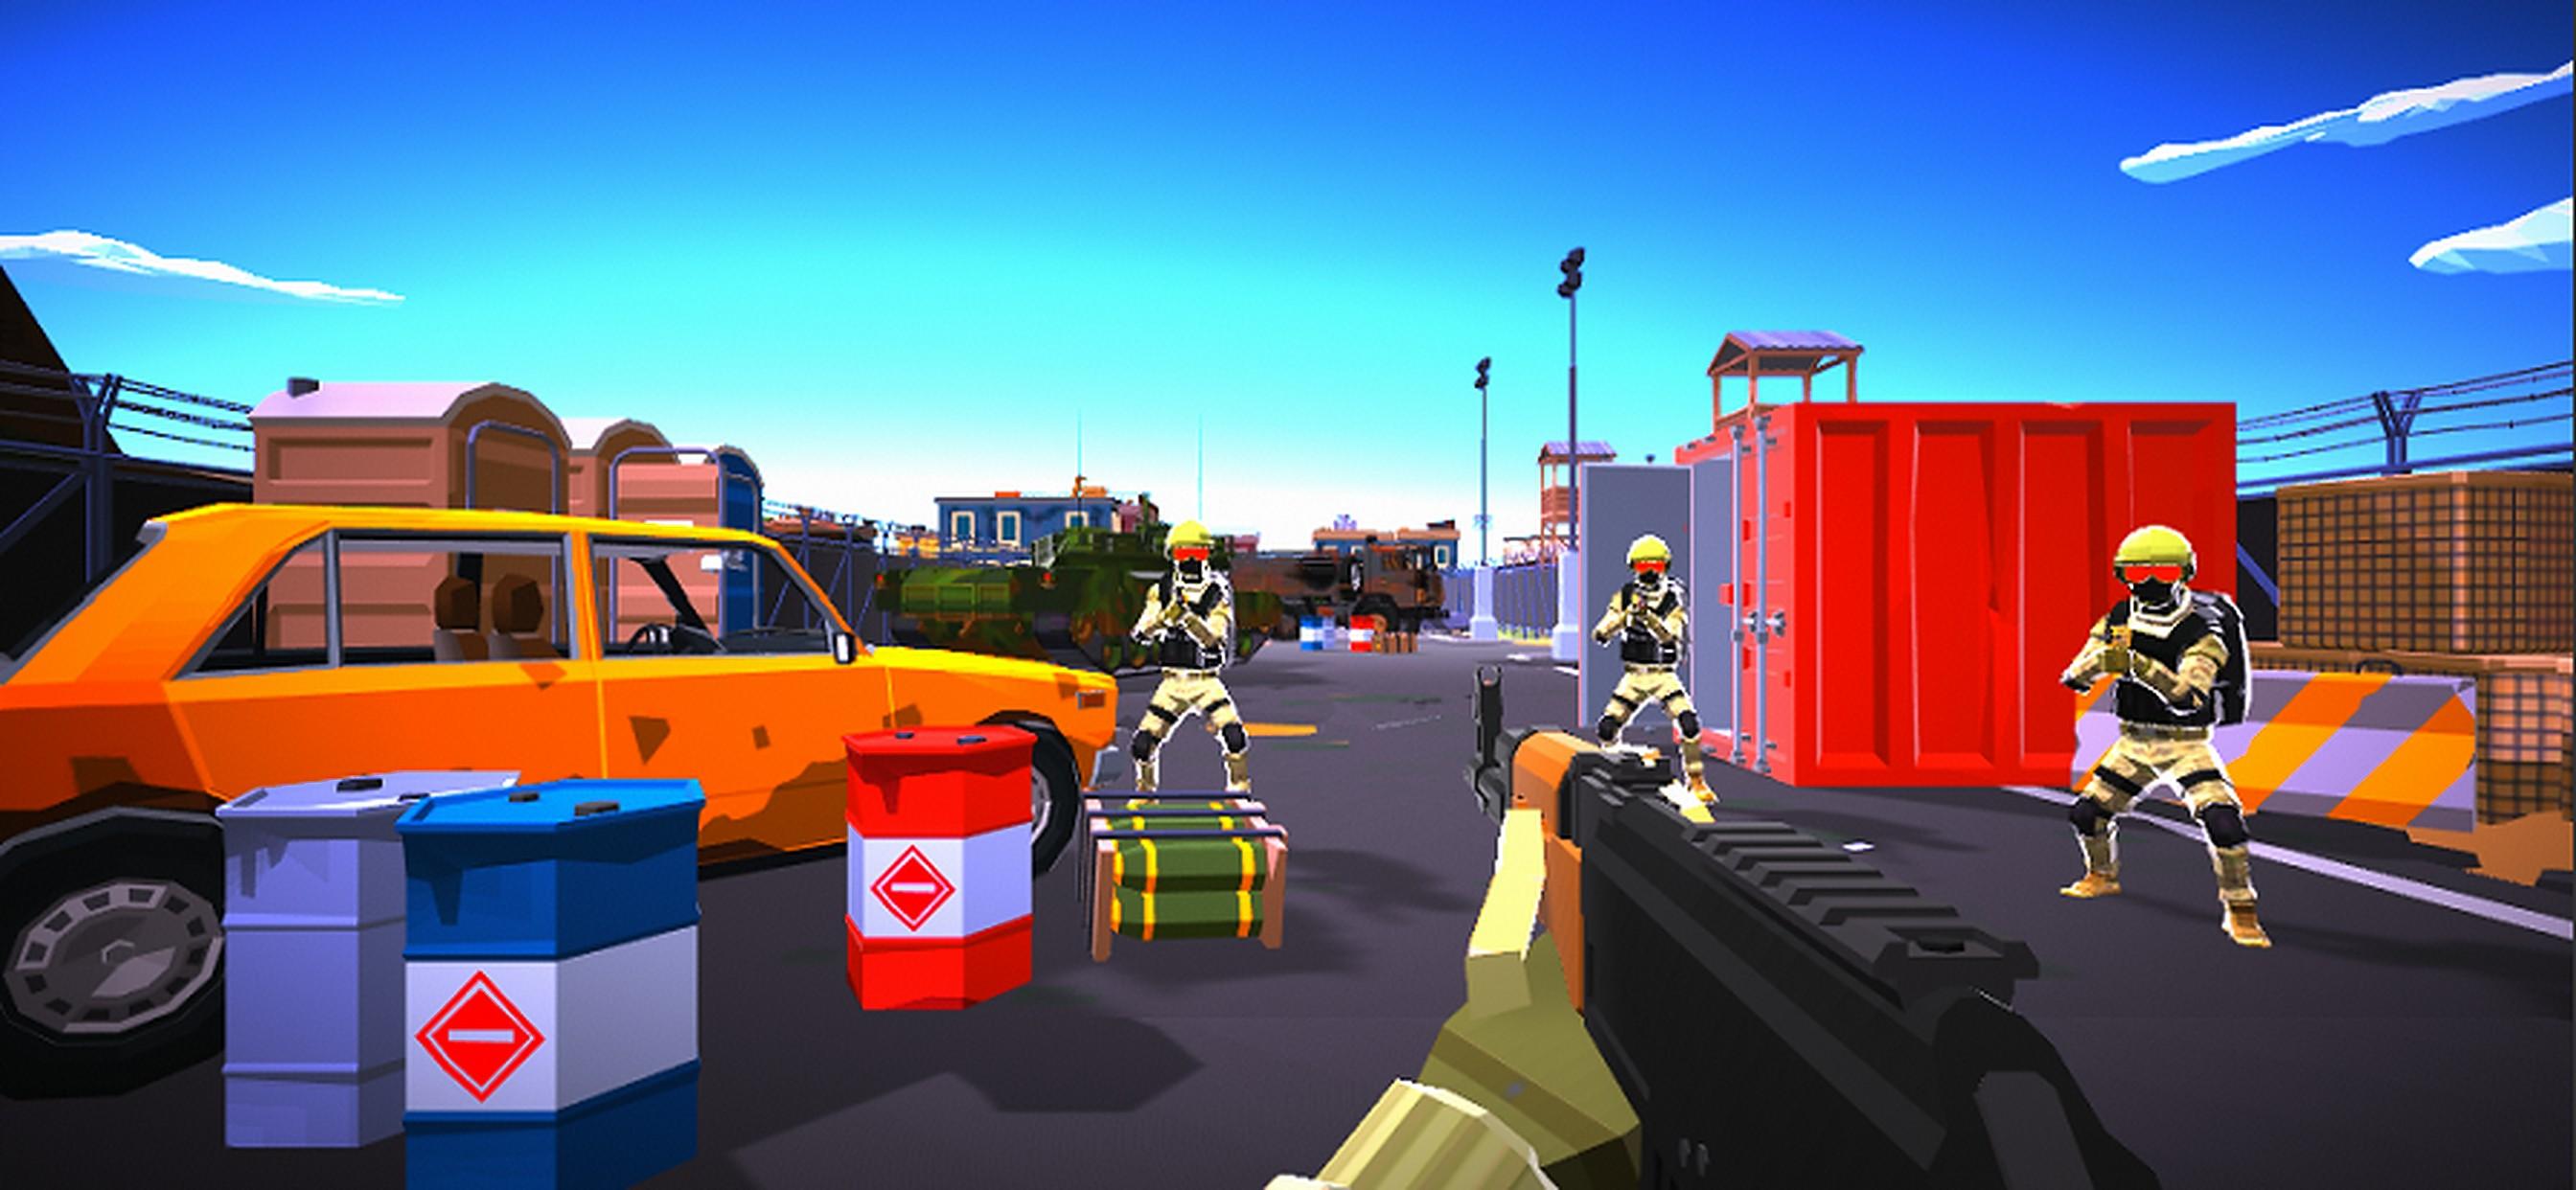 Screenshot 12: Combat Strike CS Online